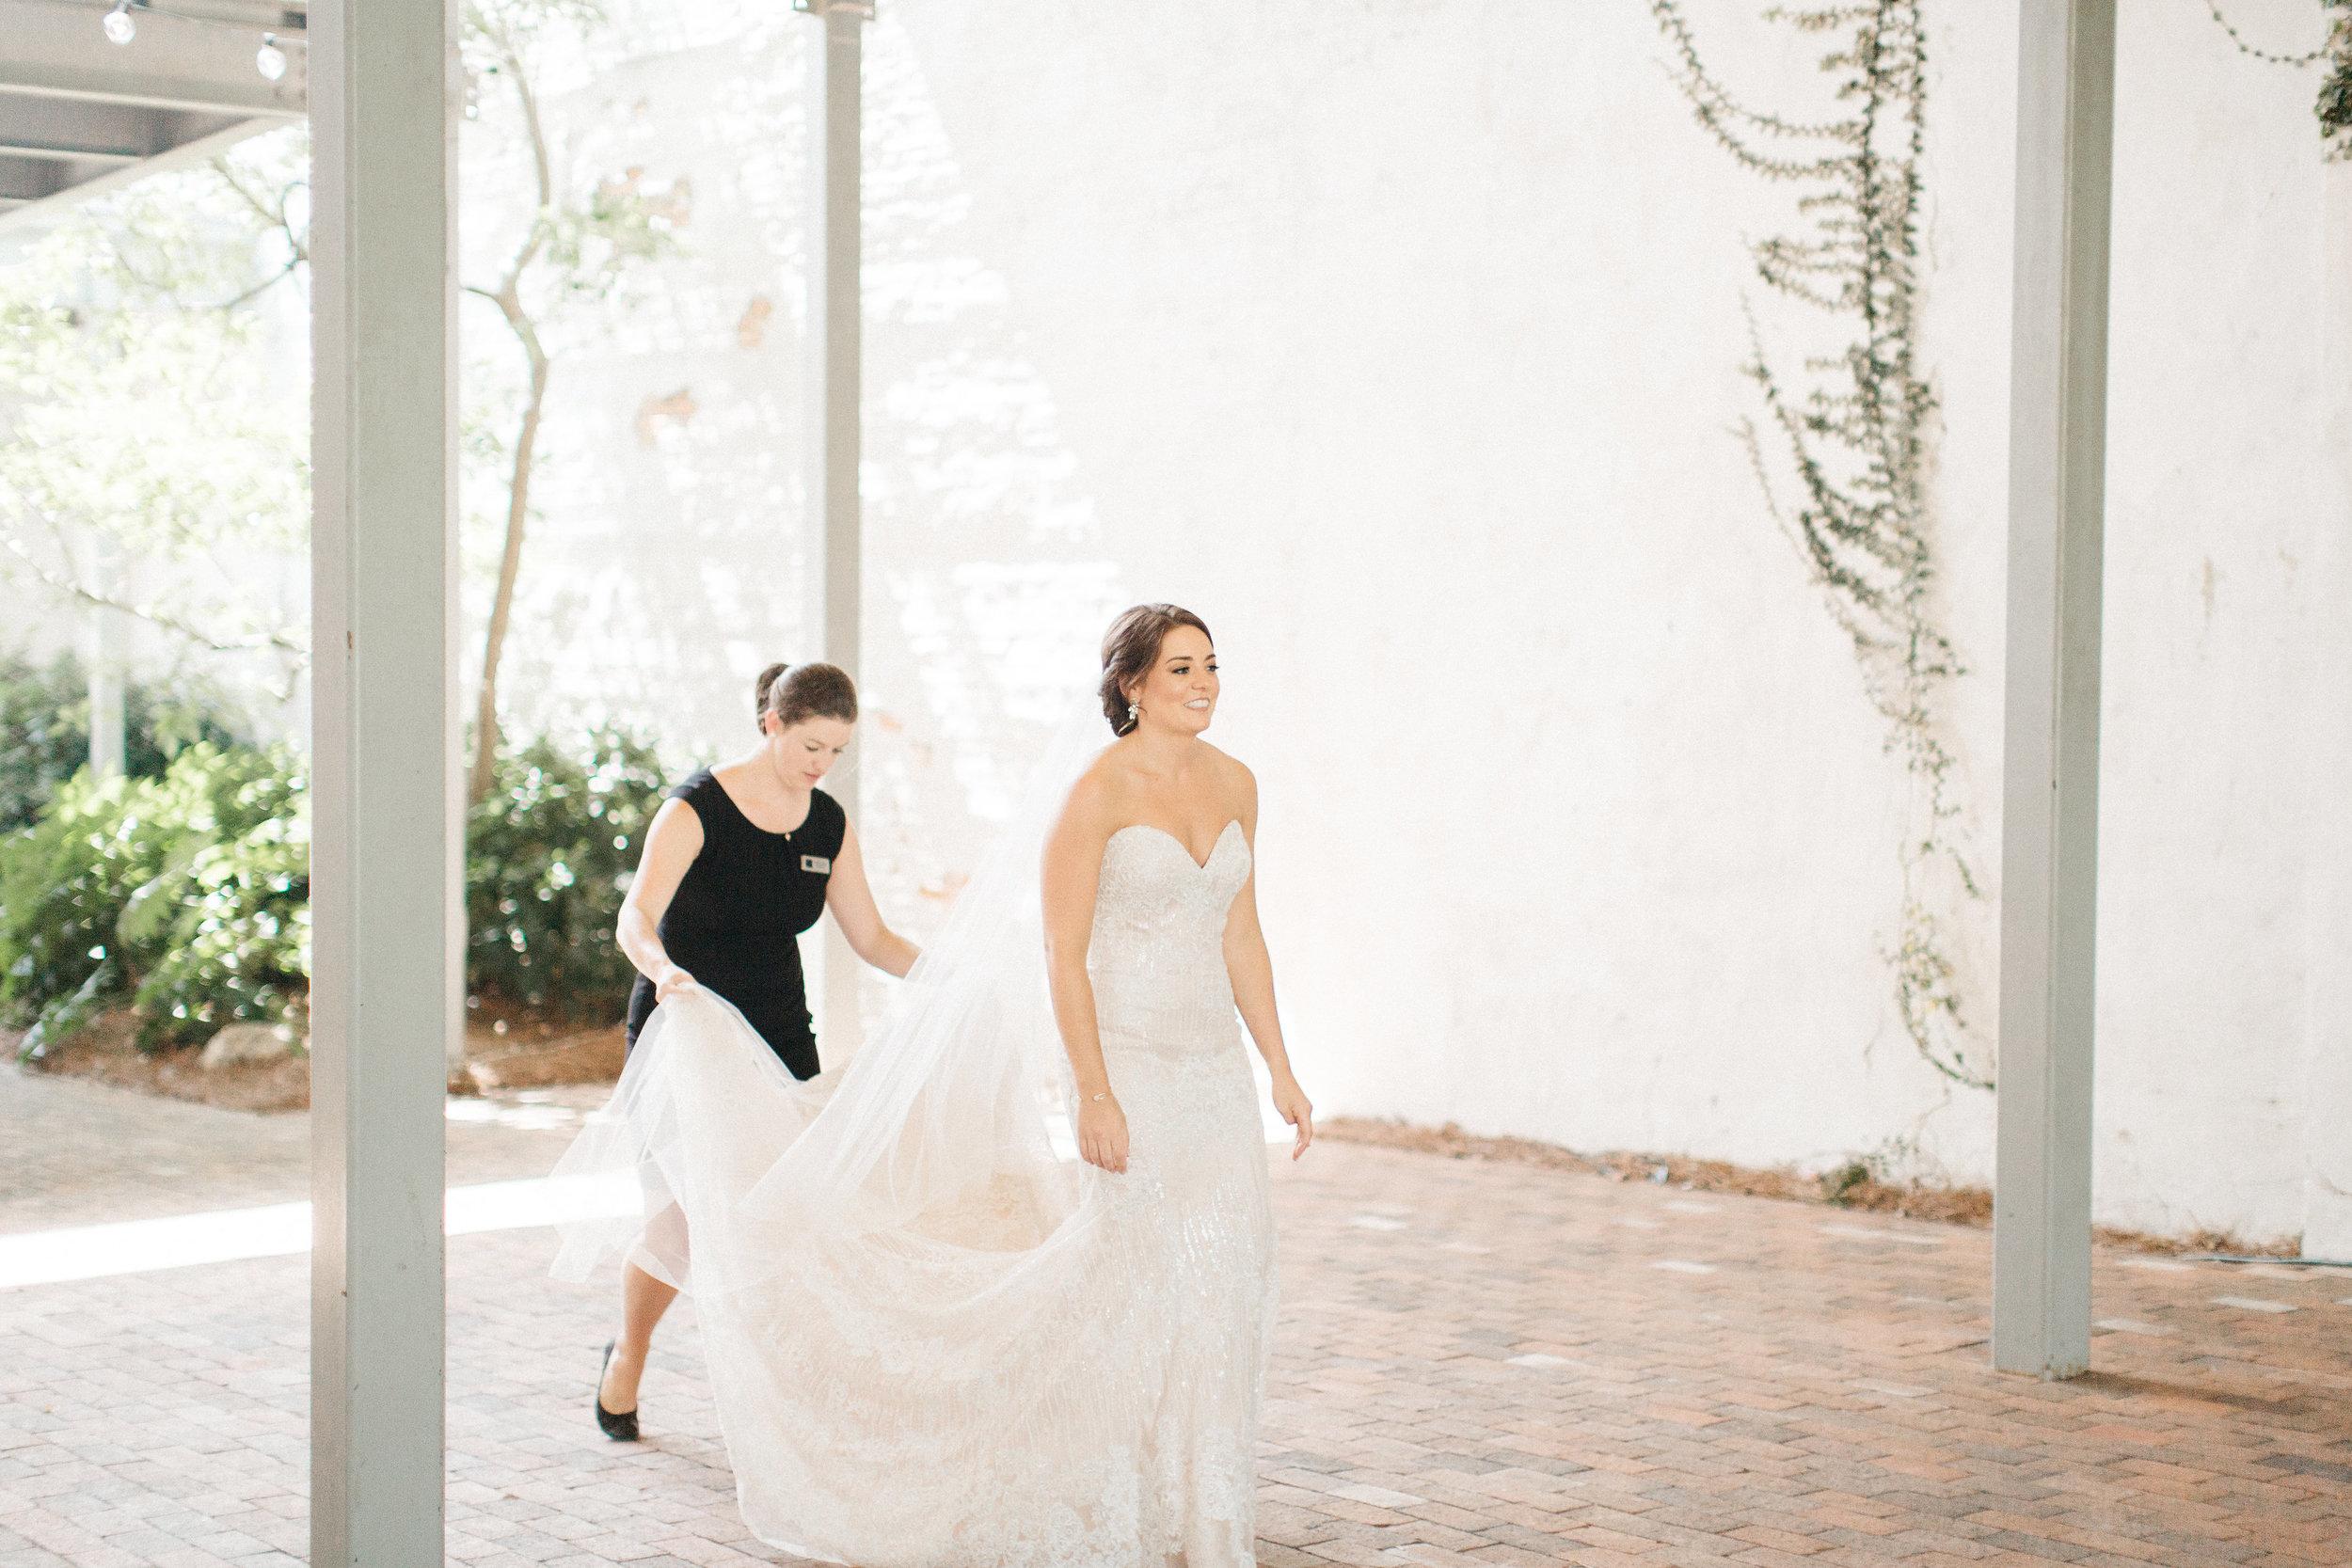 Amanda+James_ErinL.TaylorPhotography-343.jpg